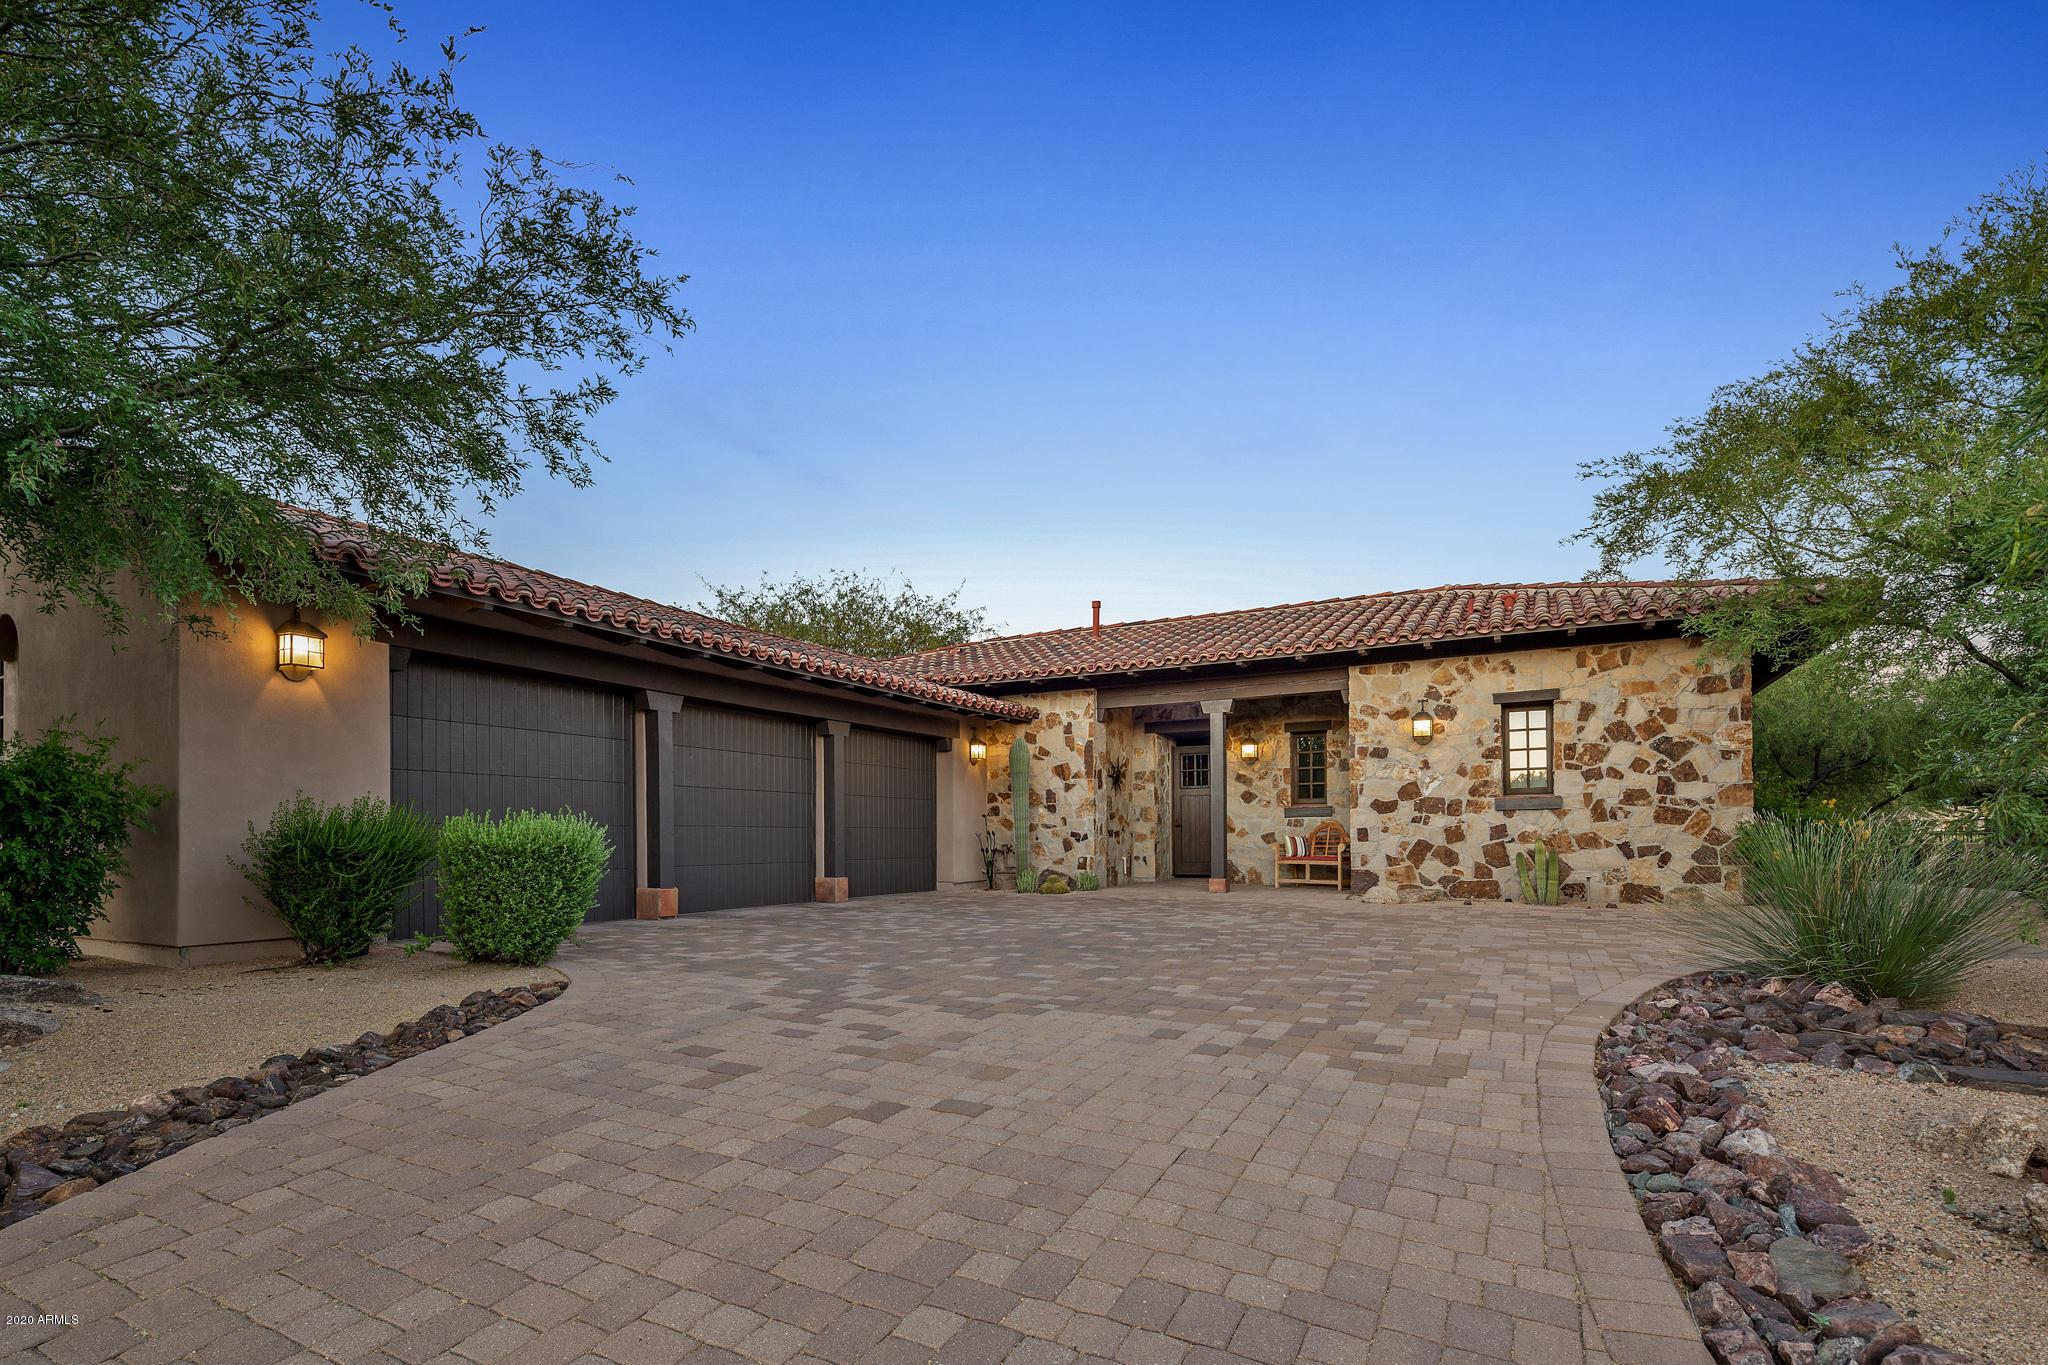 Photo of 36891 N 105TH Way, Scottsdale, AZ 85262